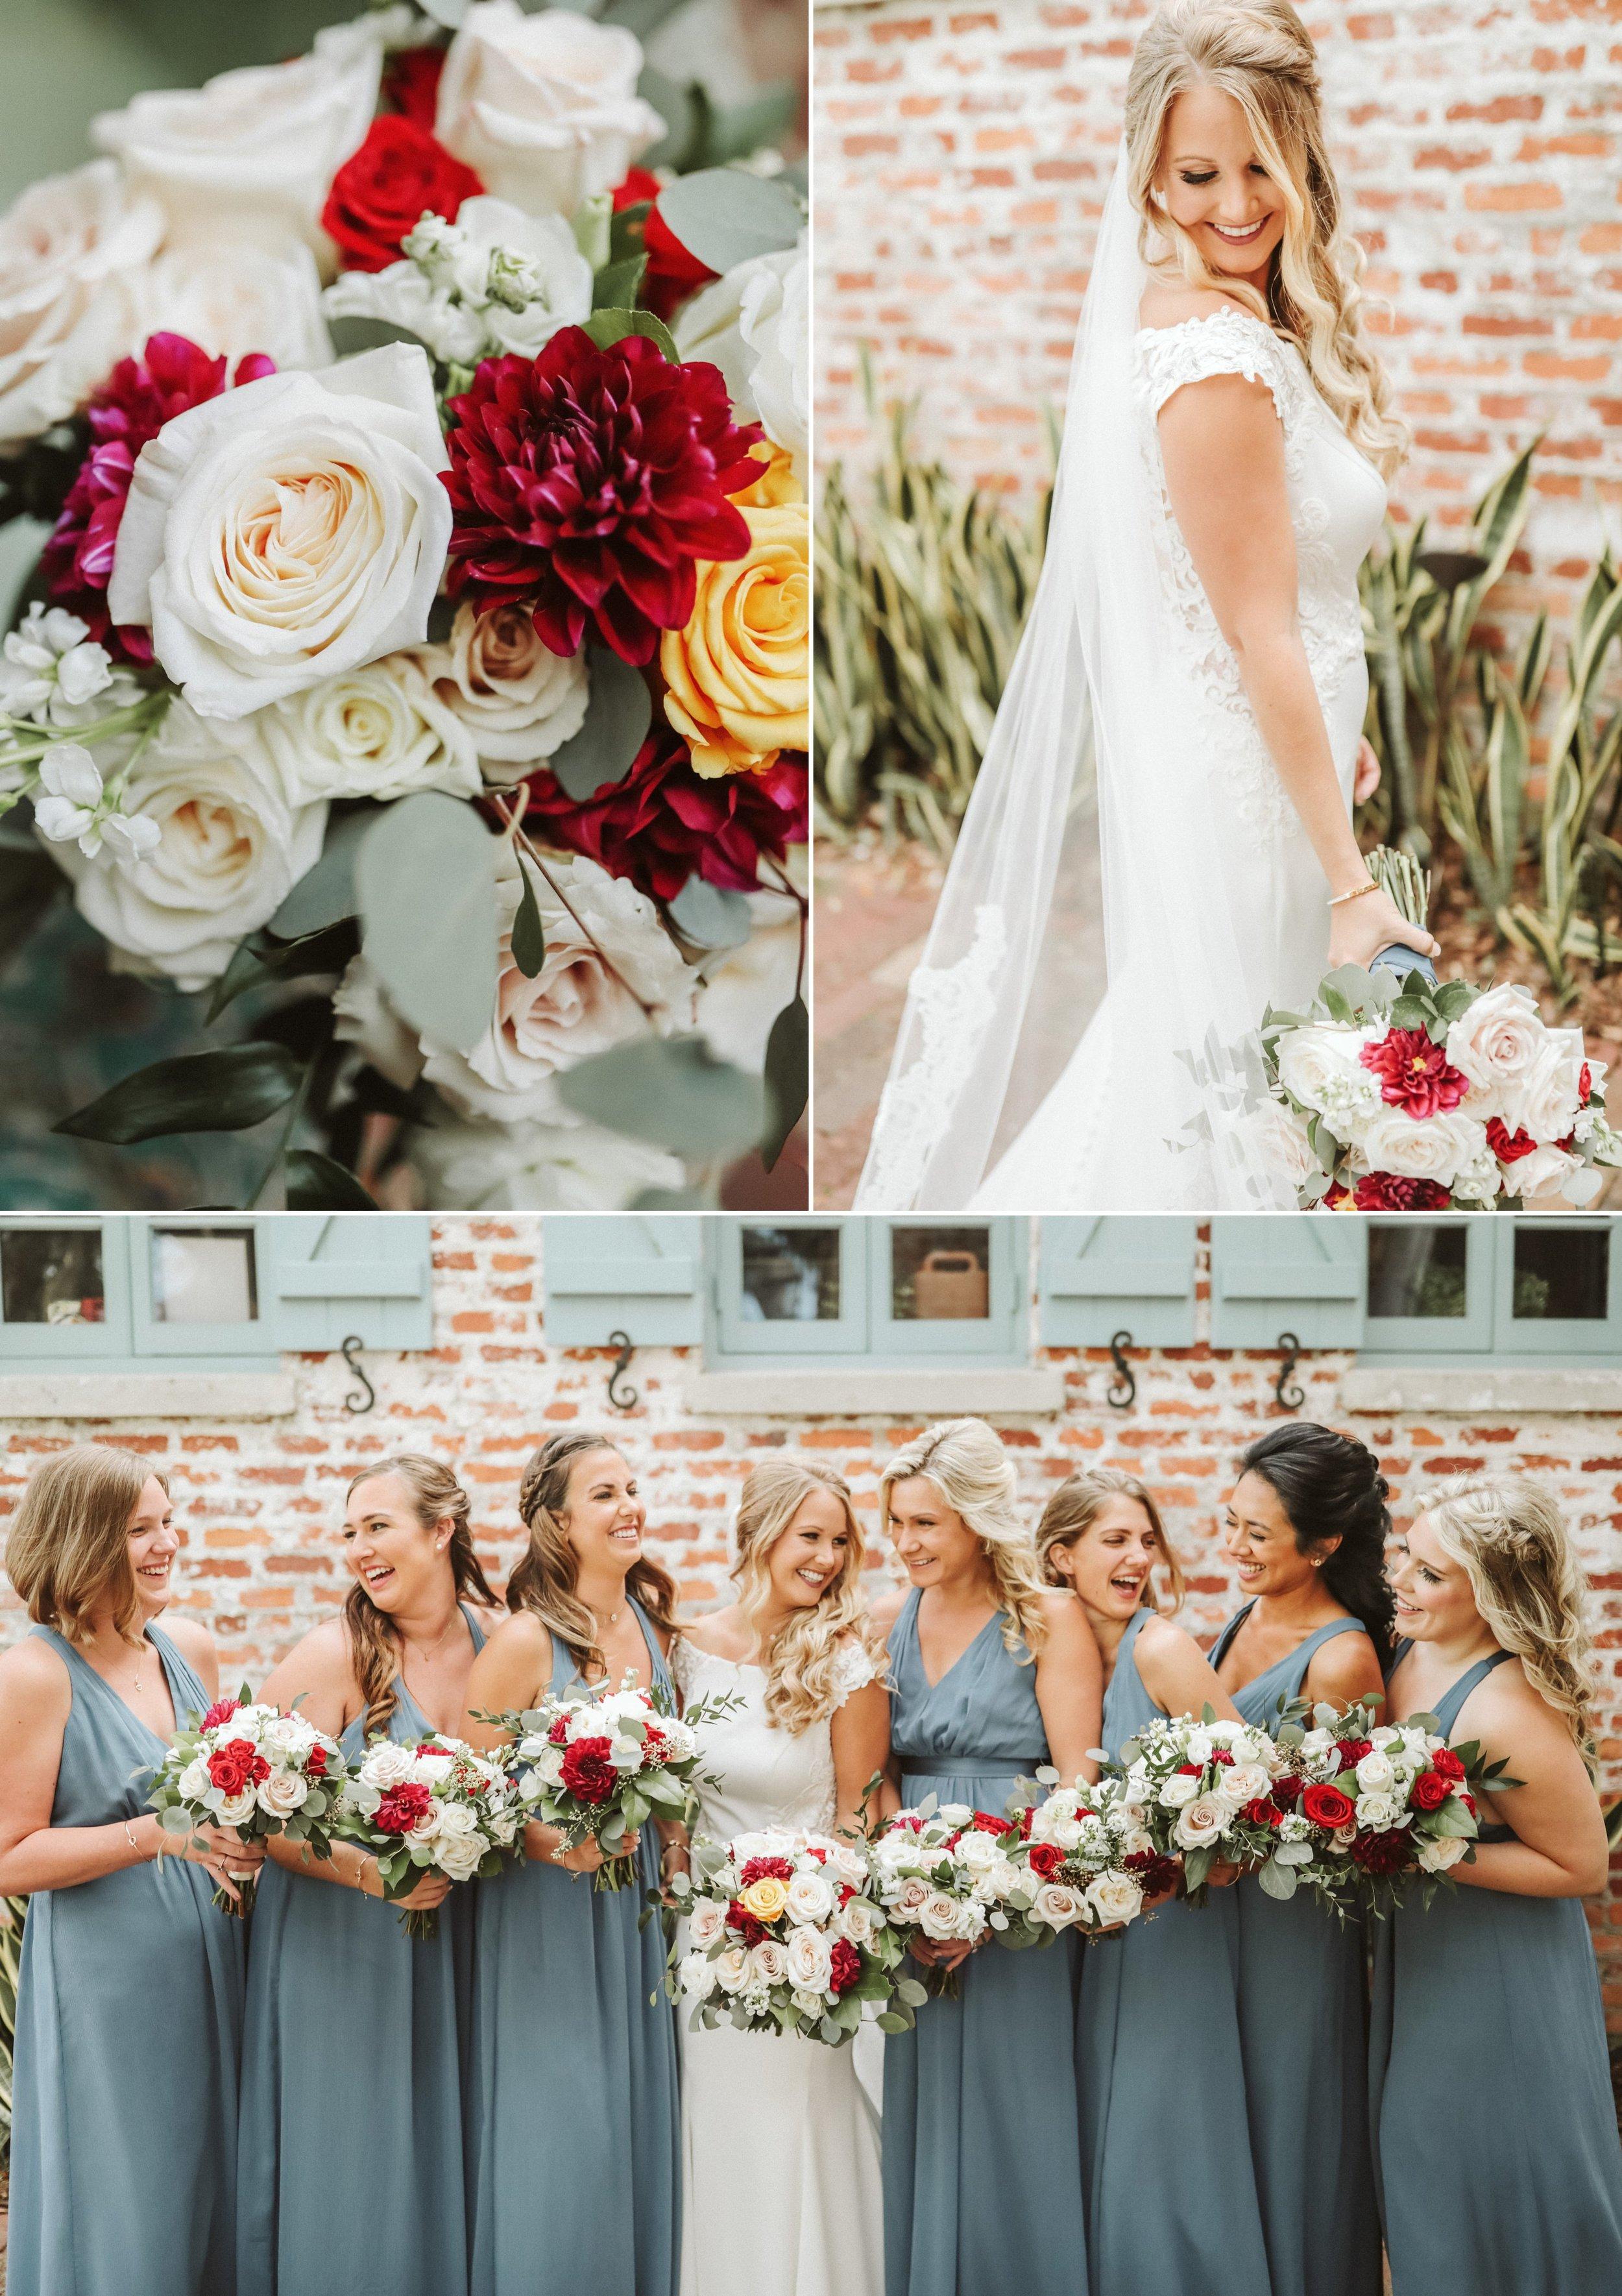 Casa Feliz Romantic Black Tie Wedding- Nick + Marissa- by Shaina DeCiryan Photography2.jpg